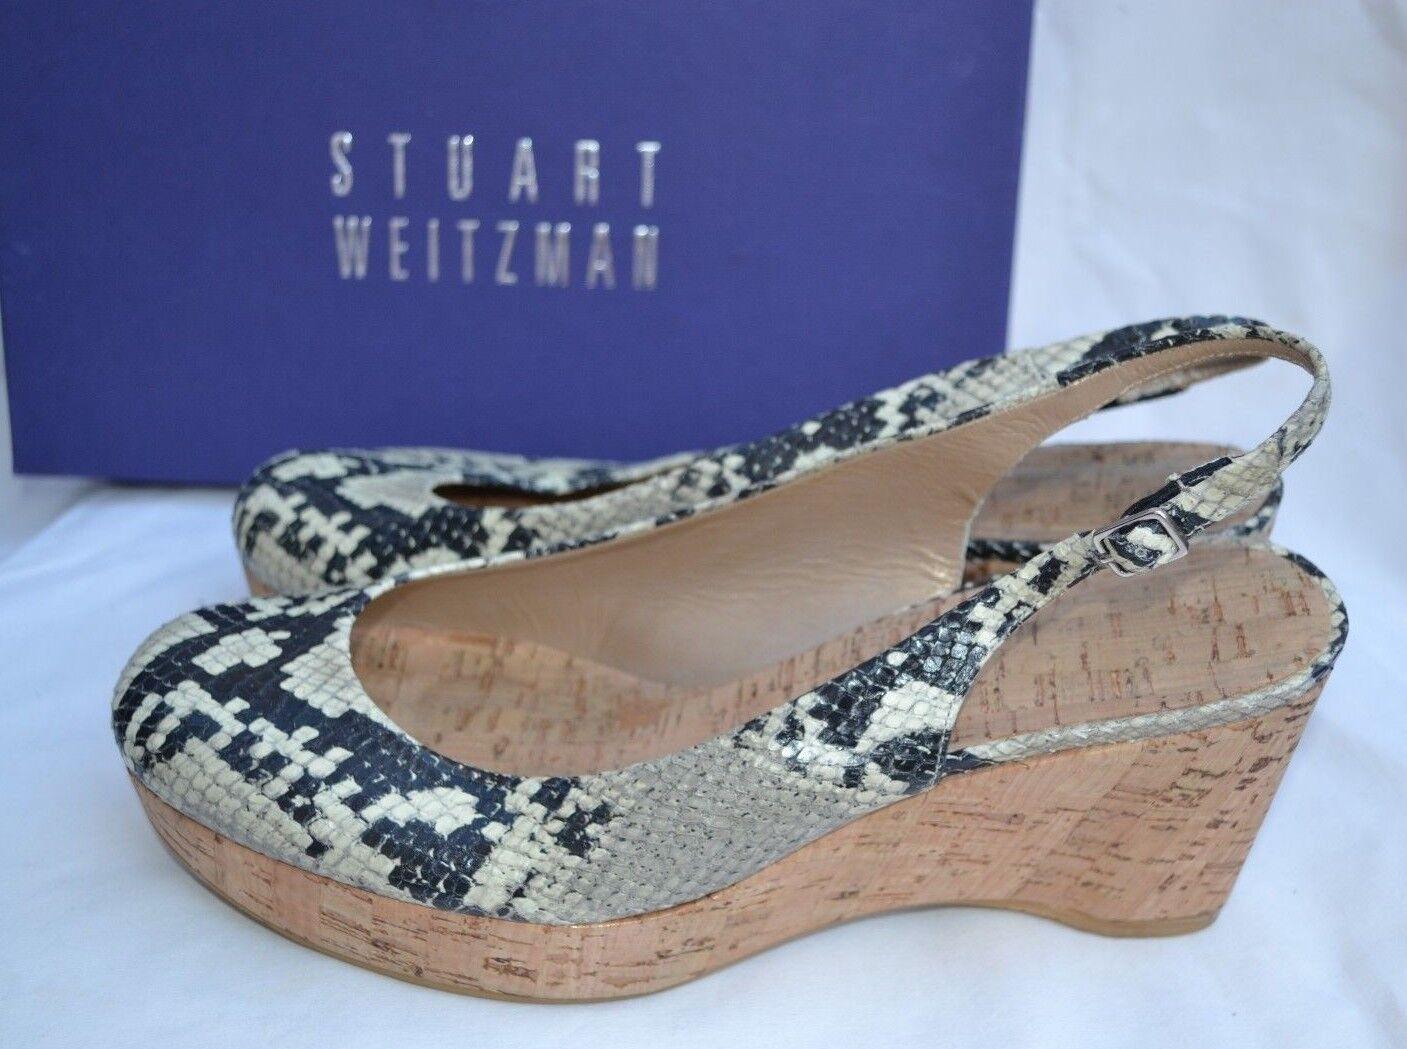 STUART WEITZMAN AUTH  399 Women's Snake Skin Leather Cork Platform Slingback 8.5